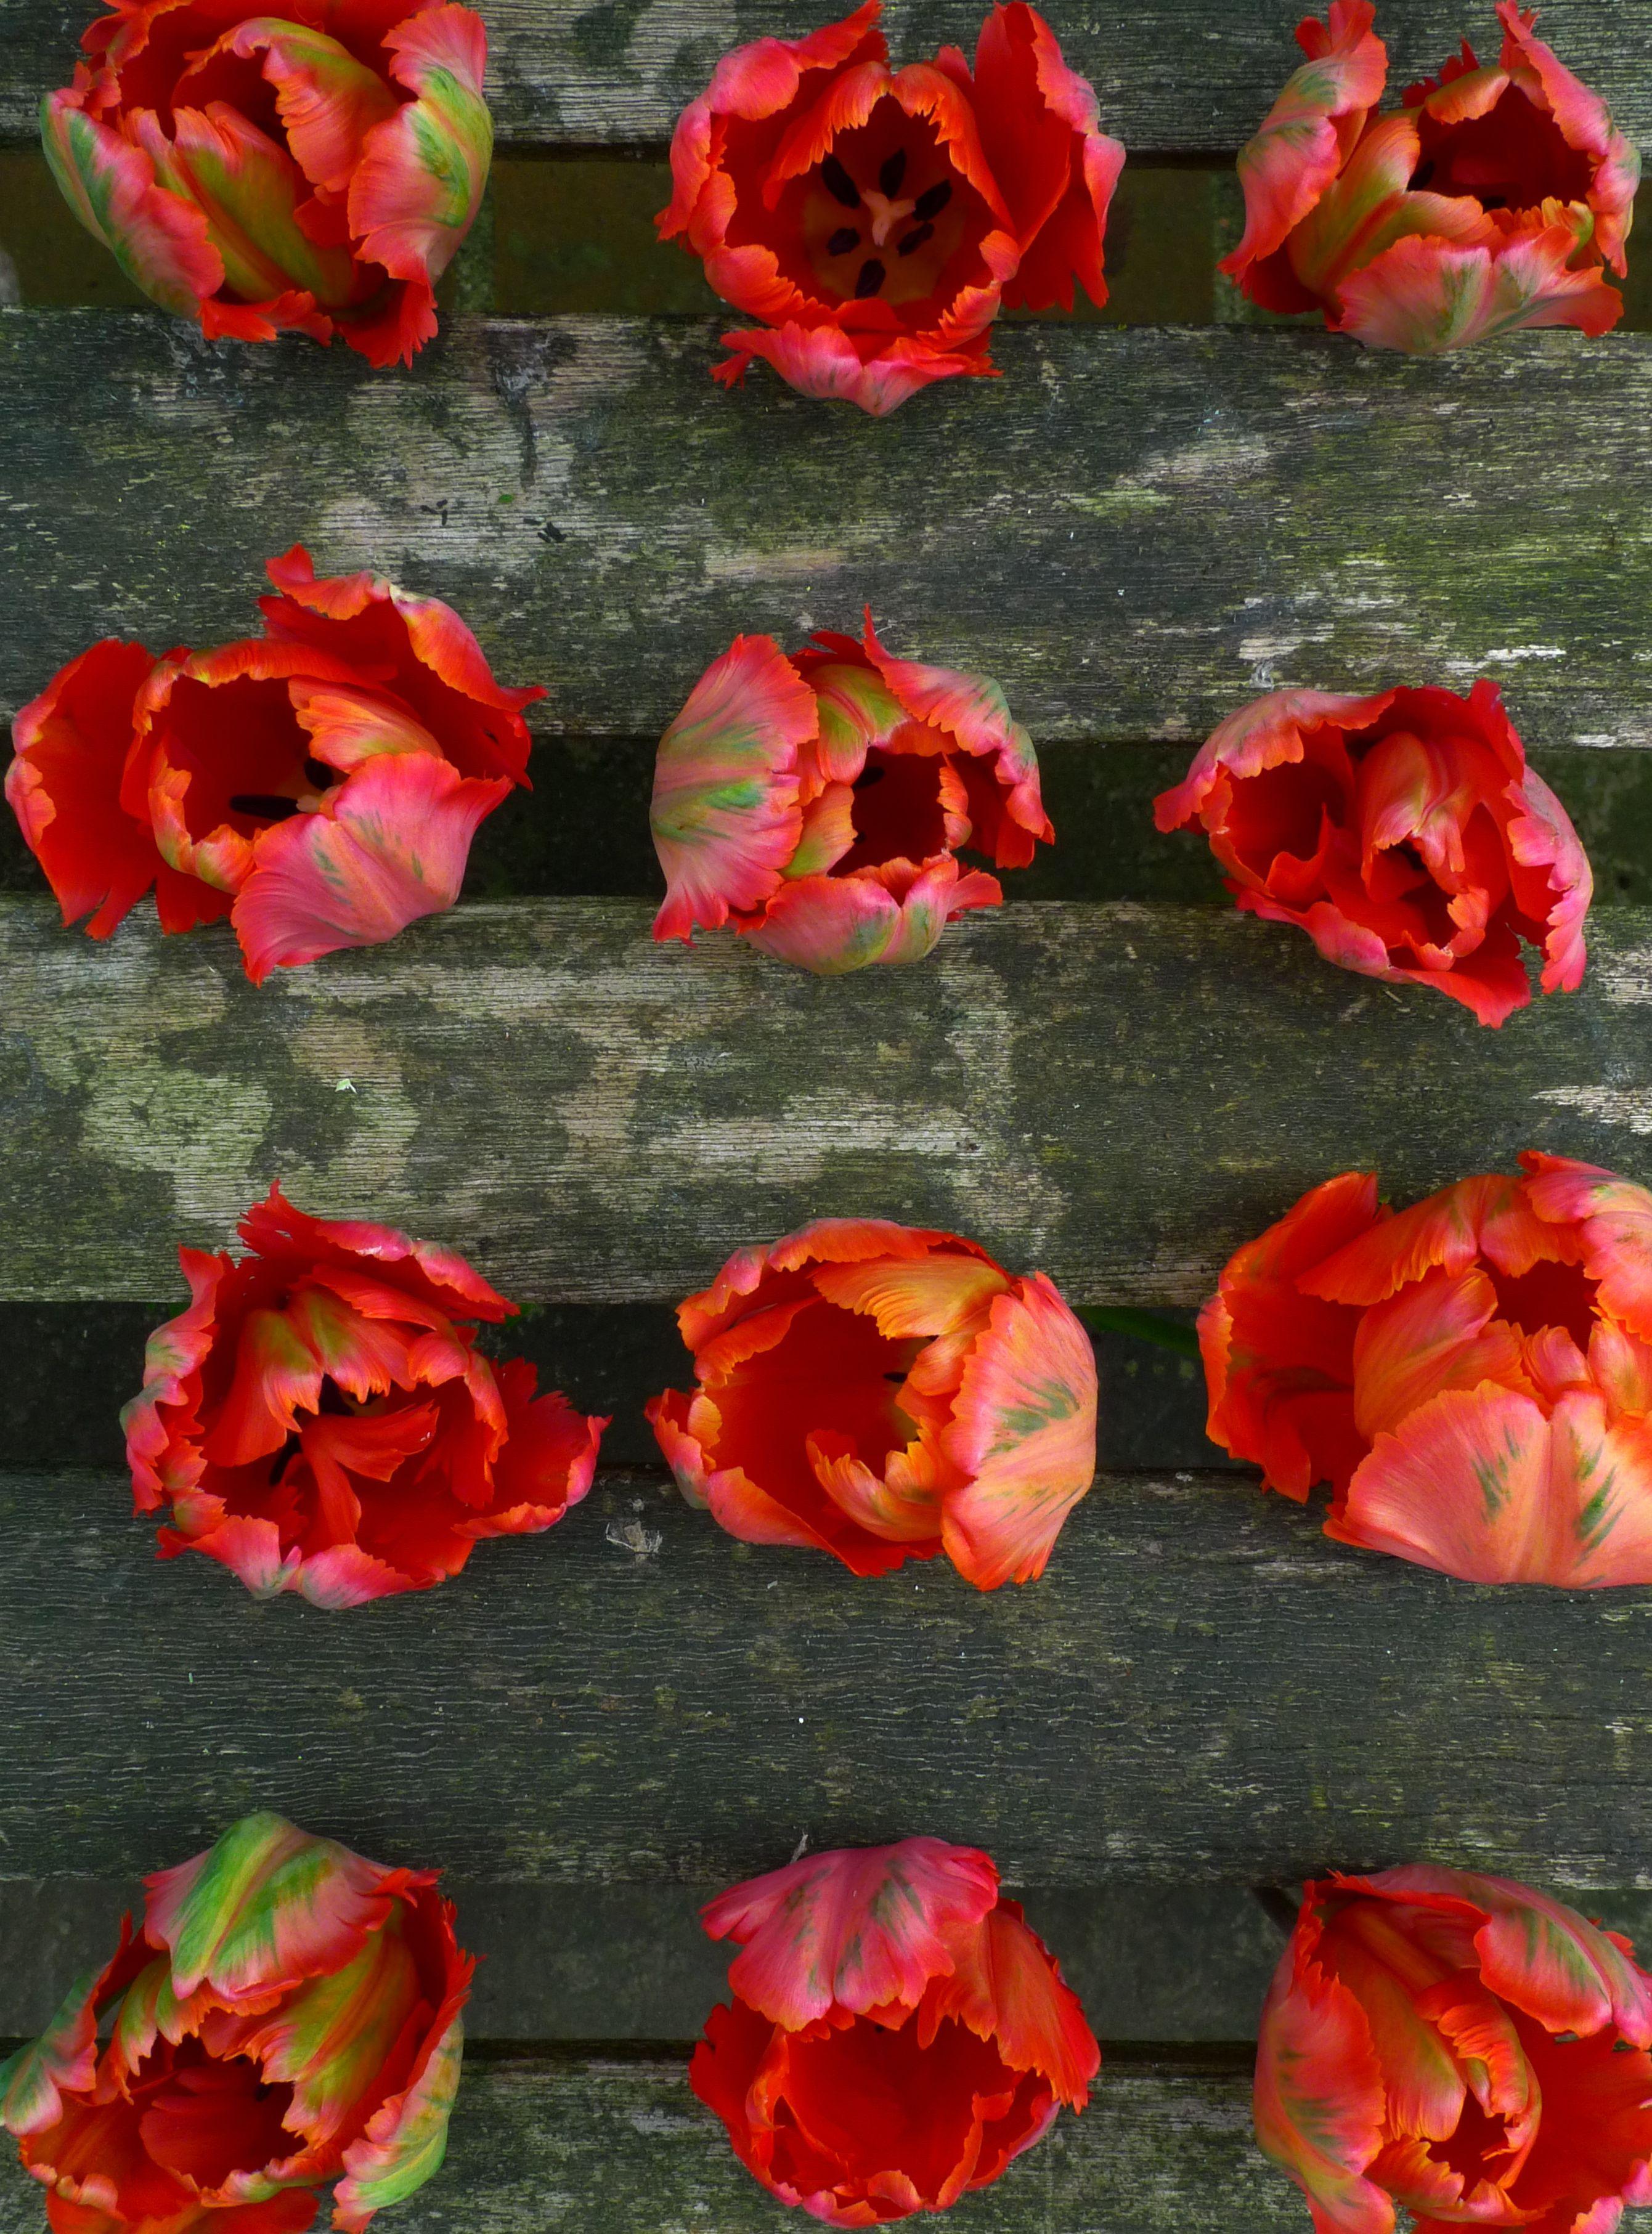 parrot tulips + weathered wood = abundant loveliness